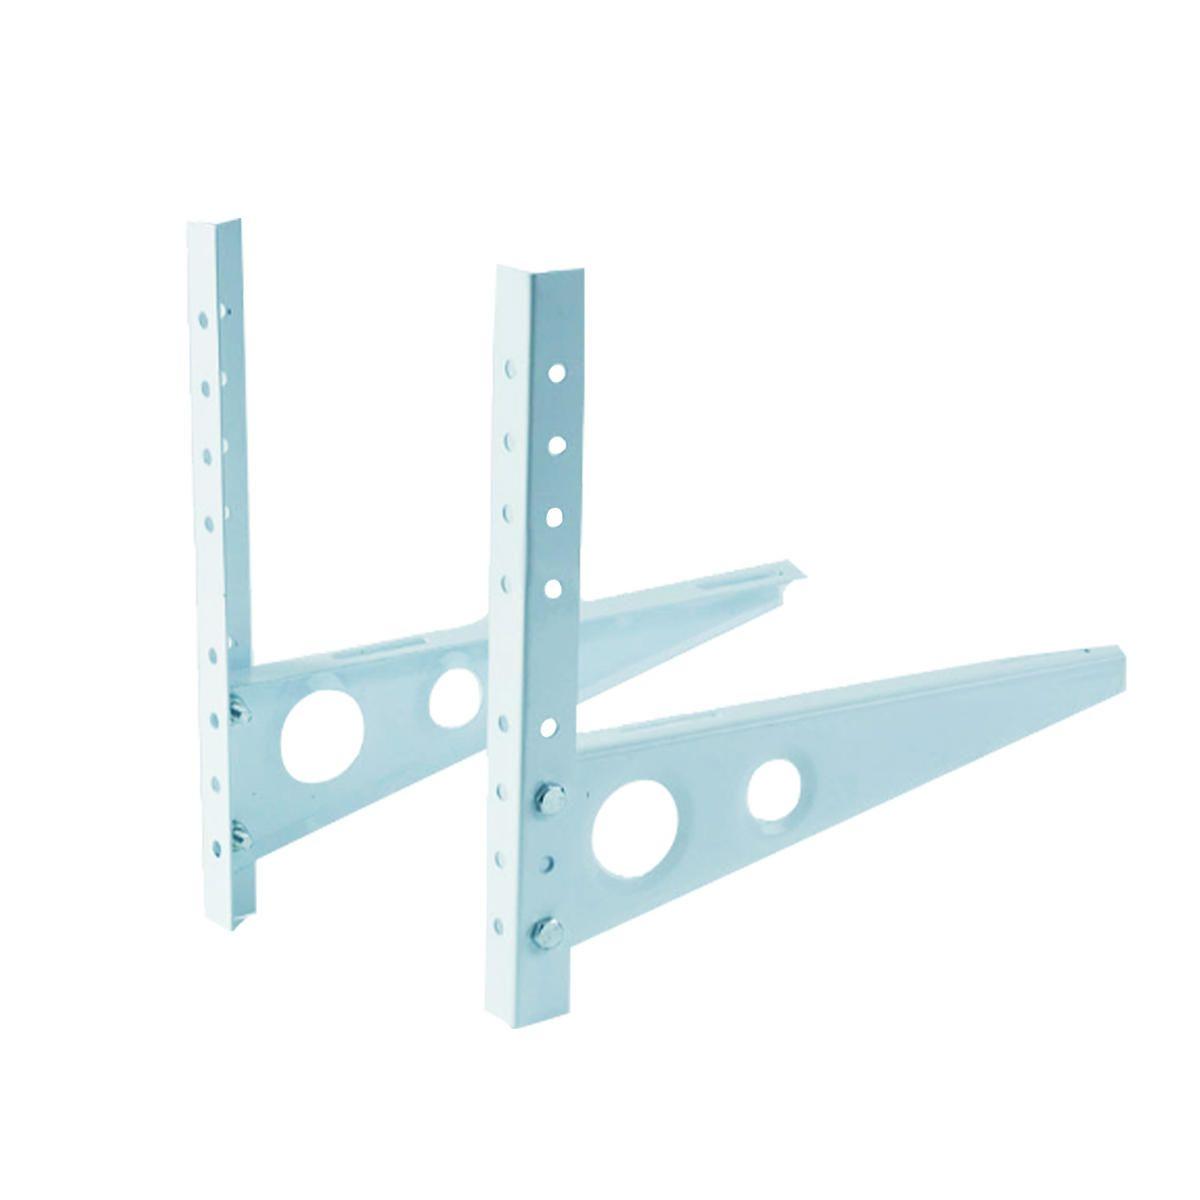 CGQ US$41.10 Air Conditioner Bracket Frame Rack Support Wall Mount Sprayed Steel Plate Split System